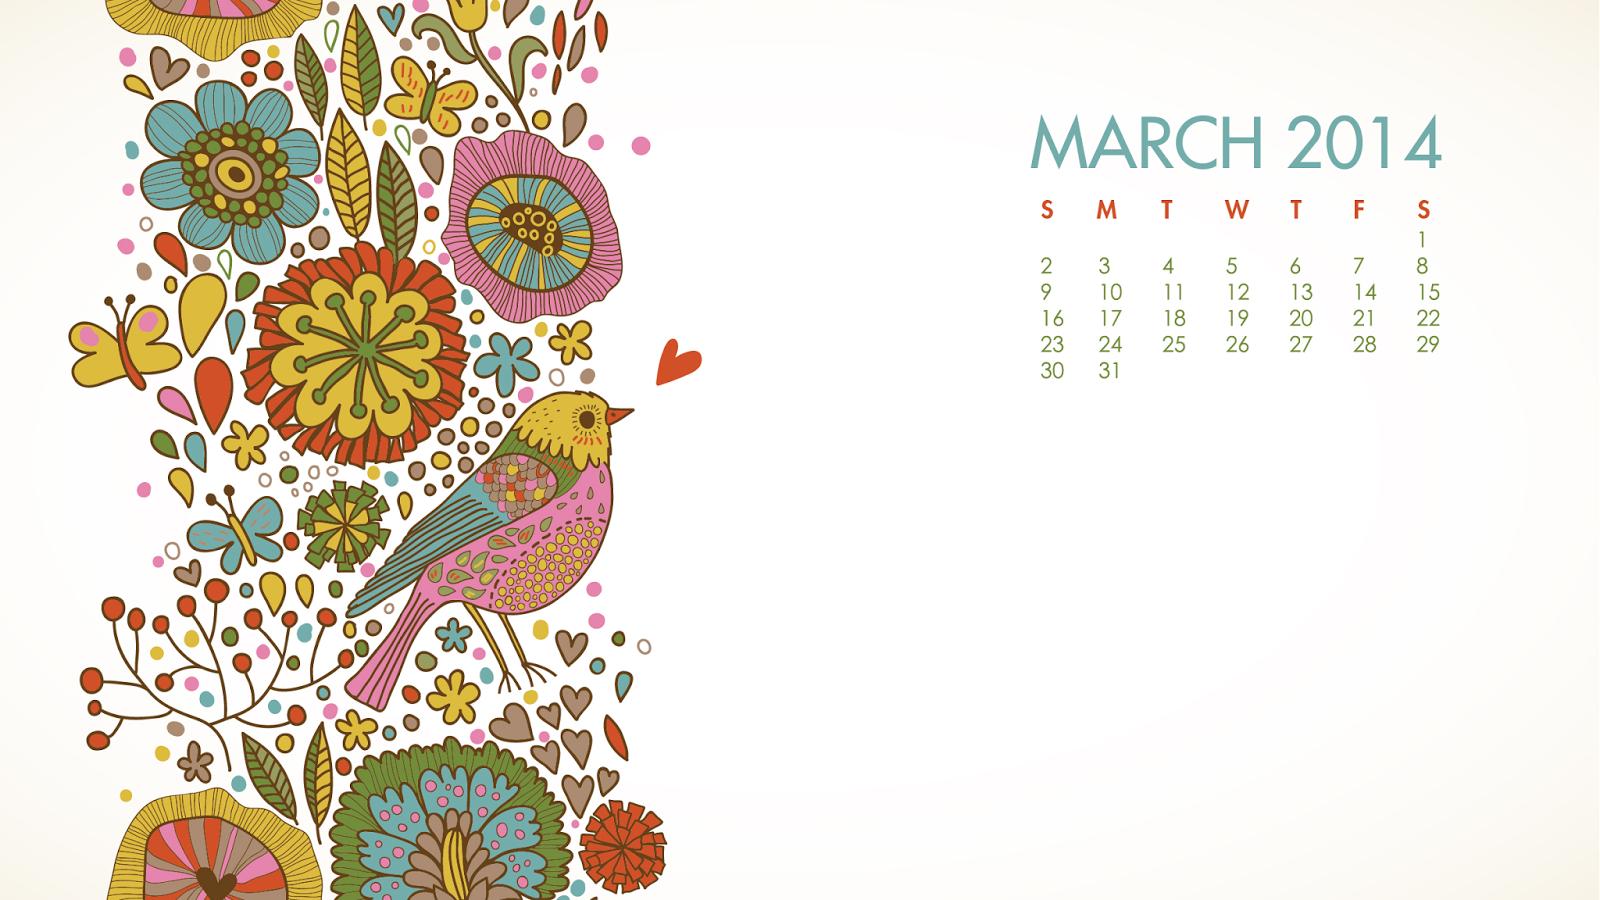 FREE MARCH 2014 DESKTOP CALENDARS